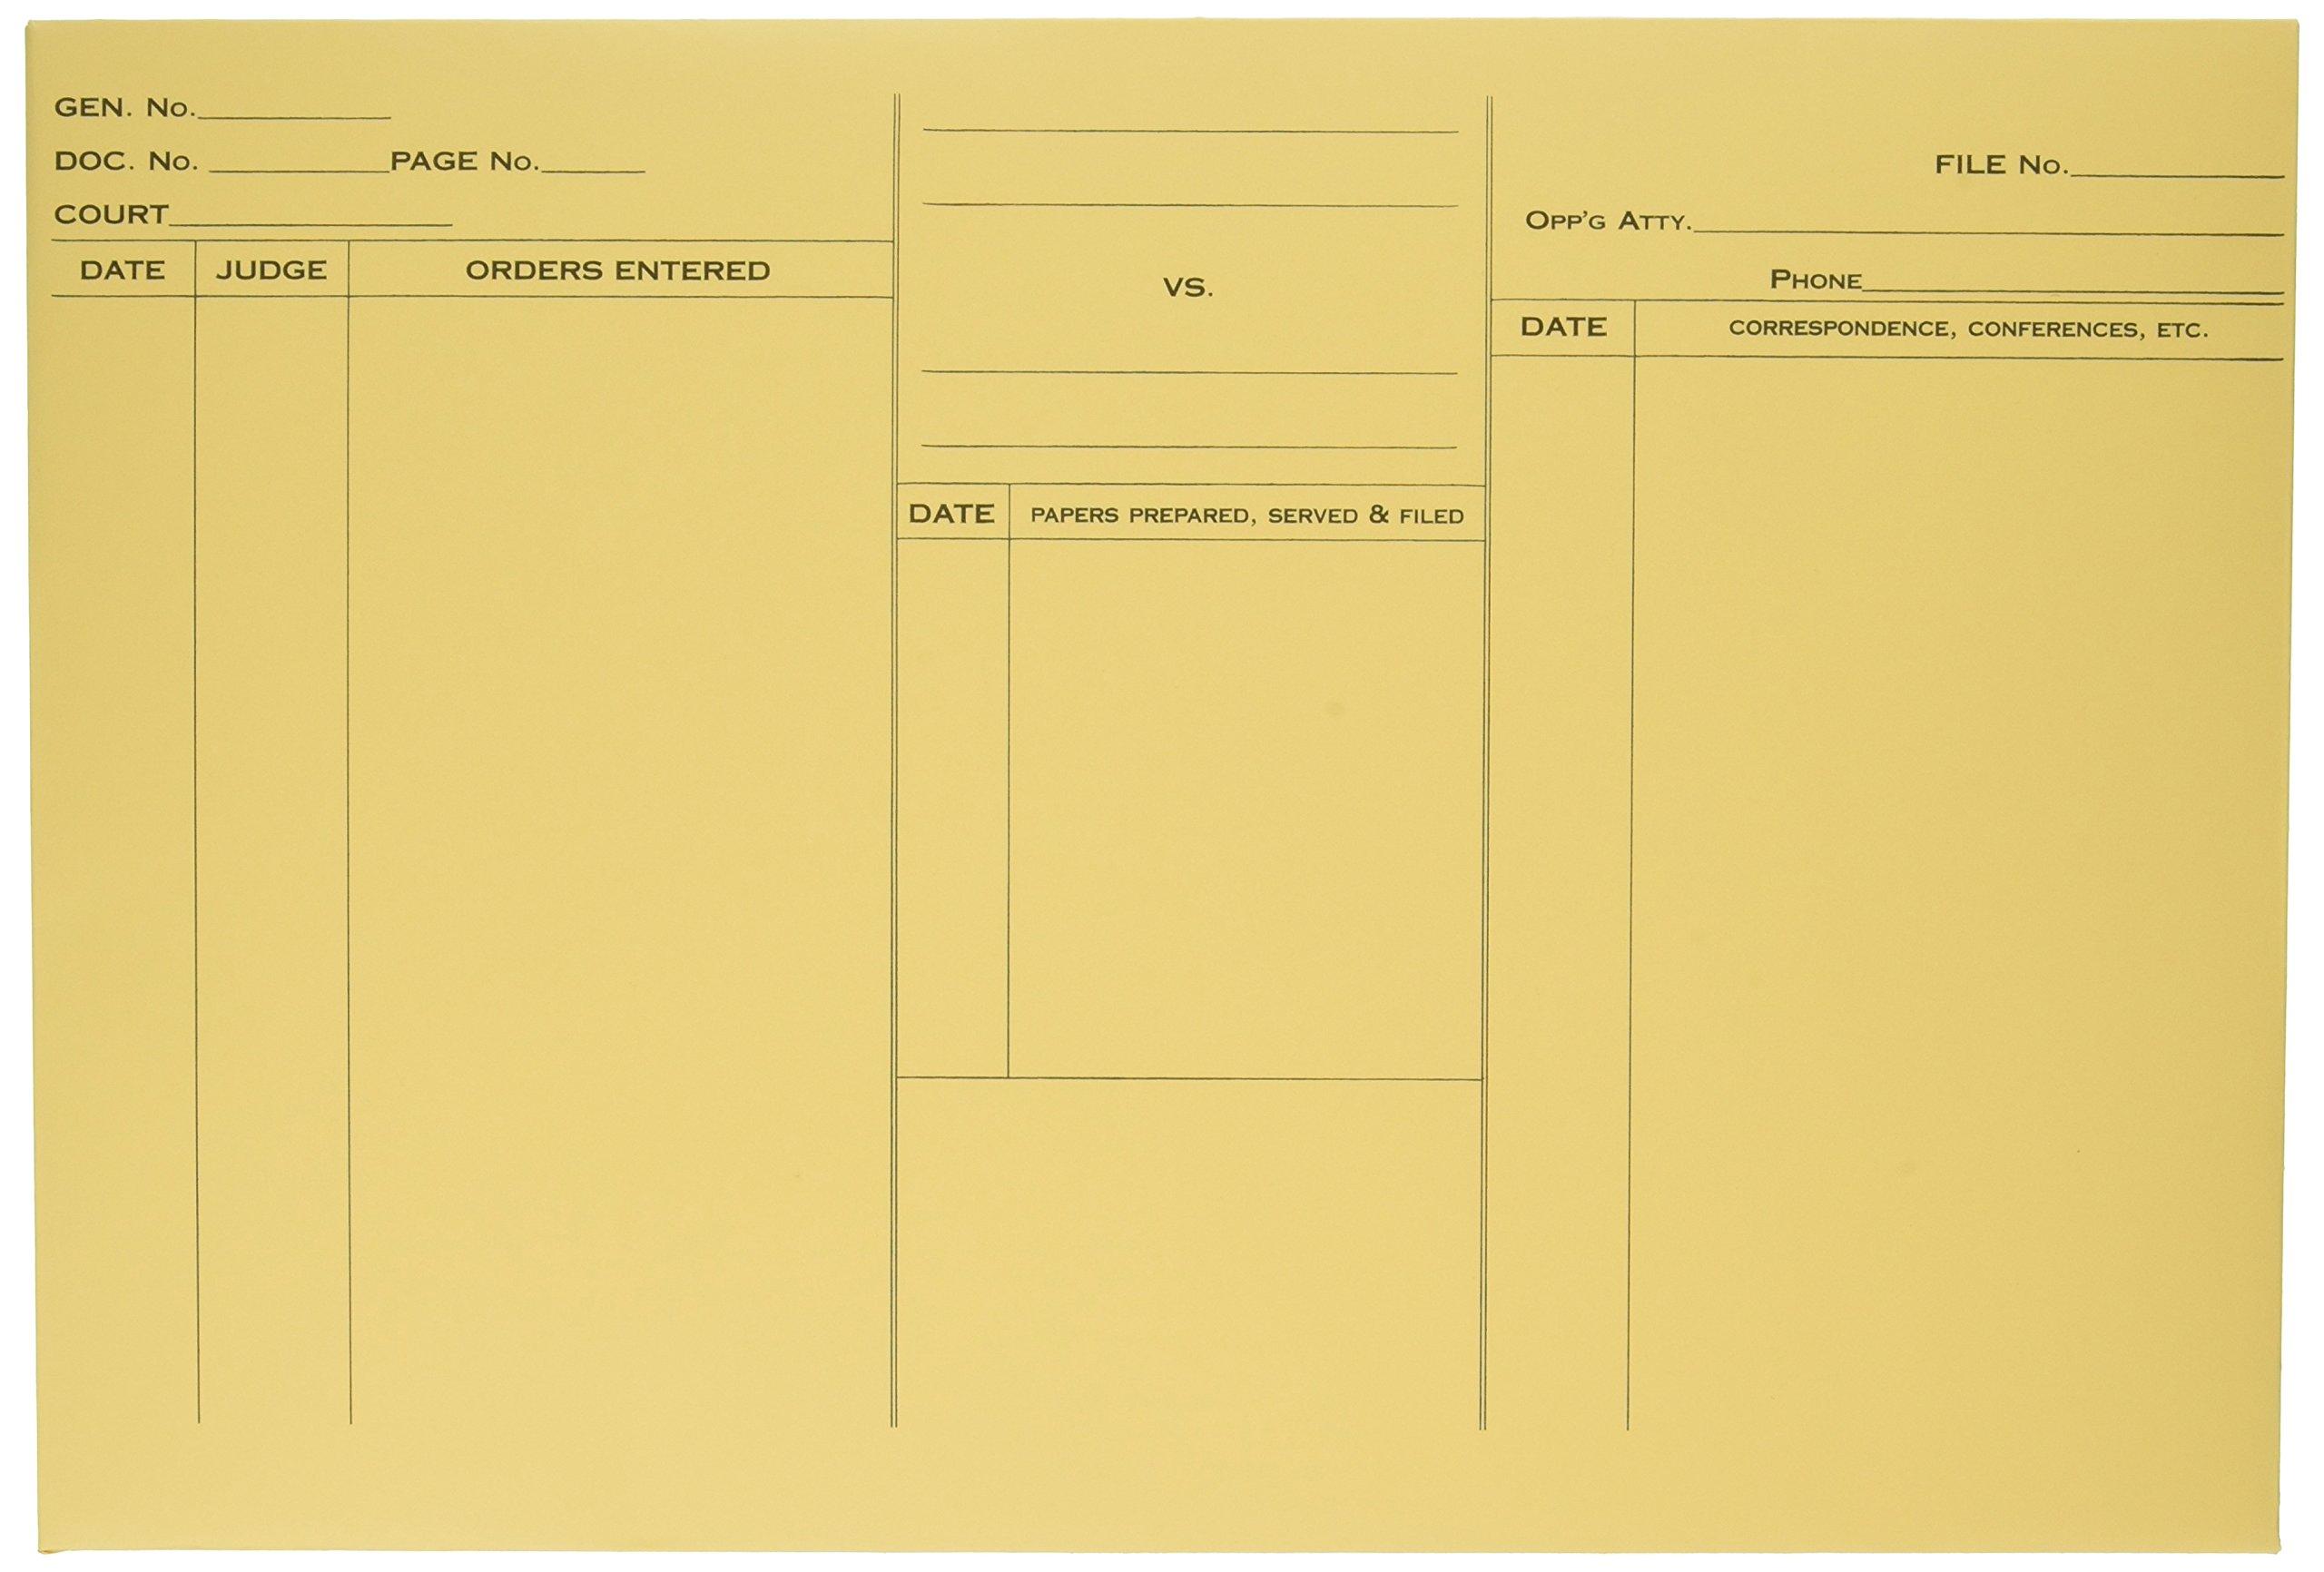 Quality Park 89701 Quality Park Attorney's Envelopes, Ungummed, 10x14-3/4, Heavy Cameo Buff,100/Bx by Quality Park